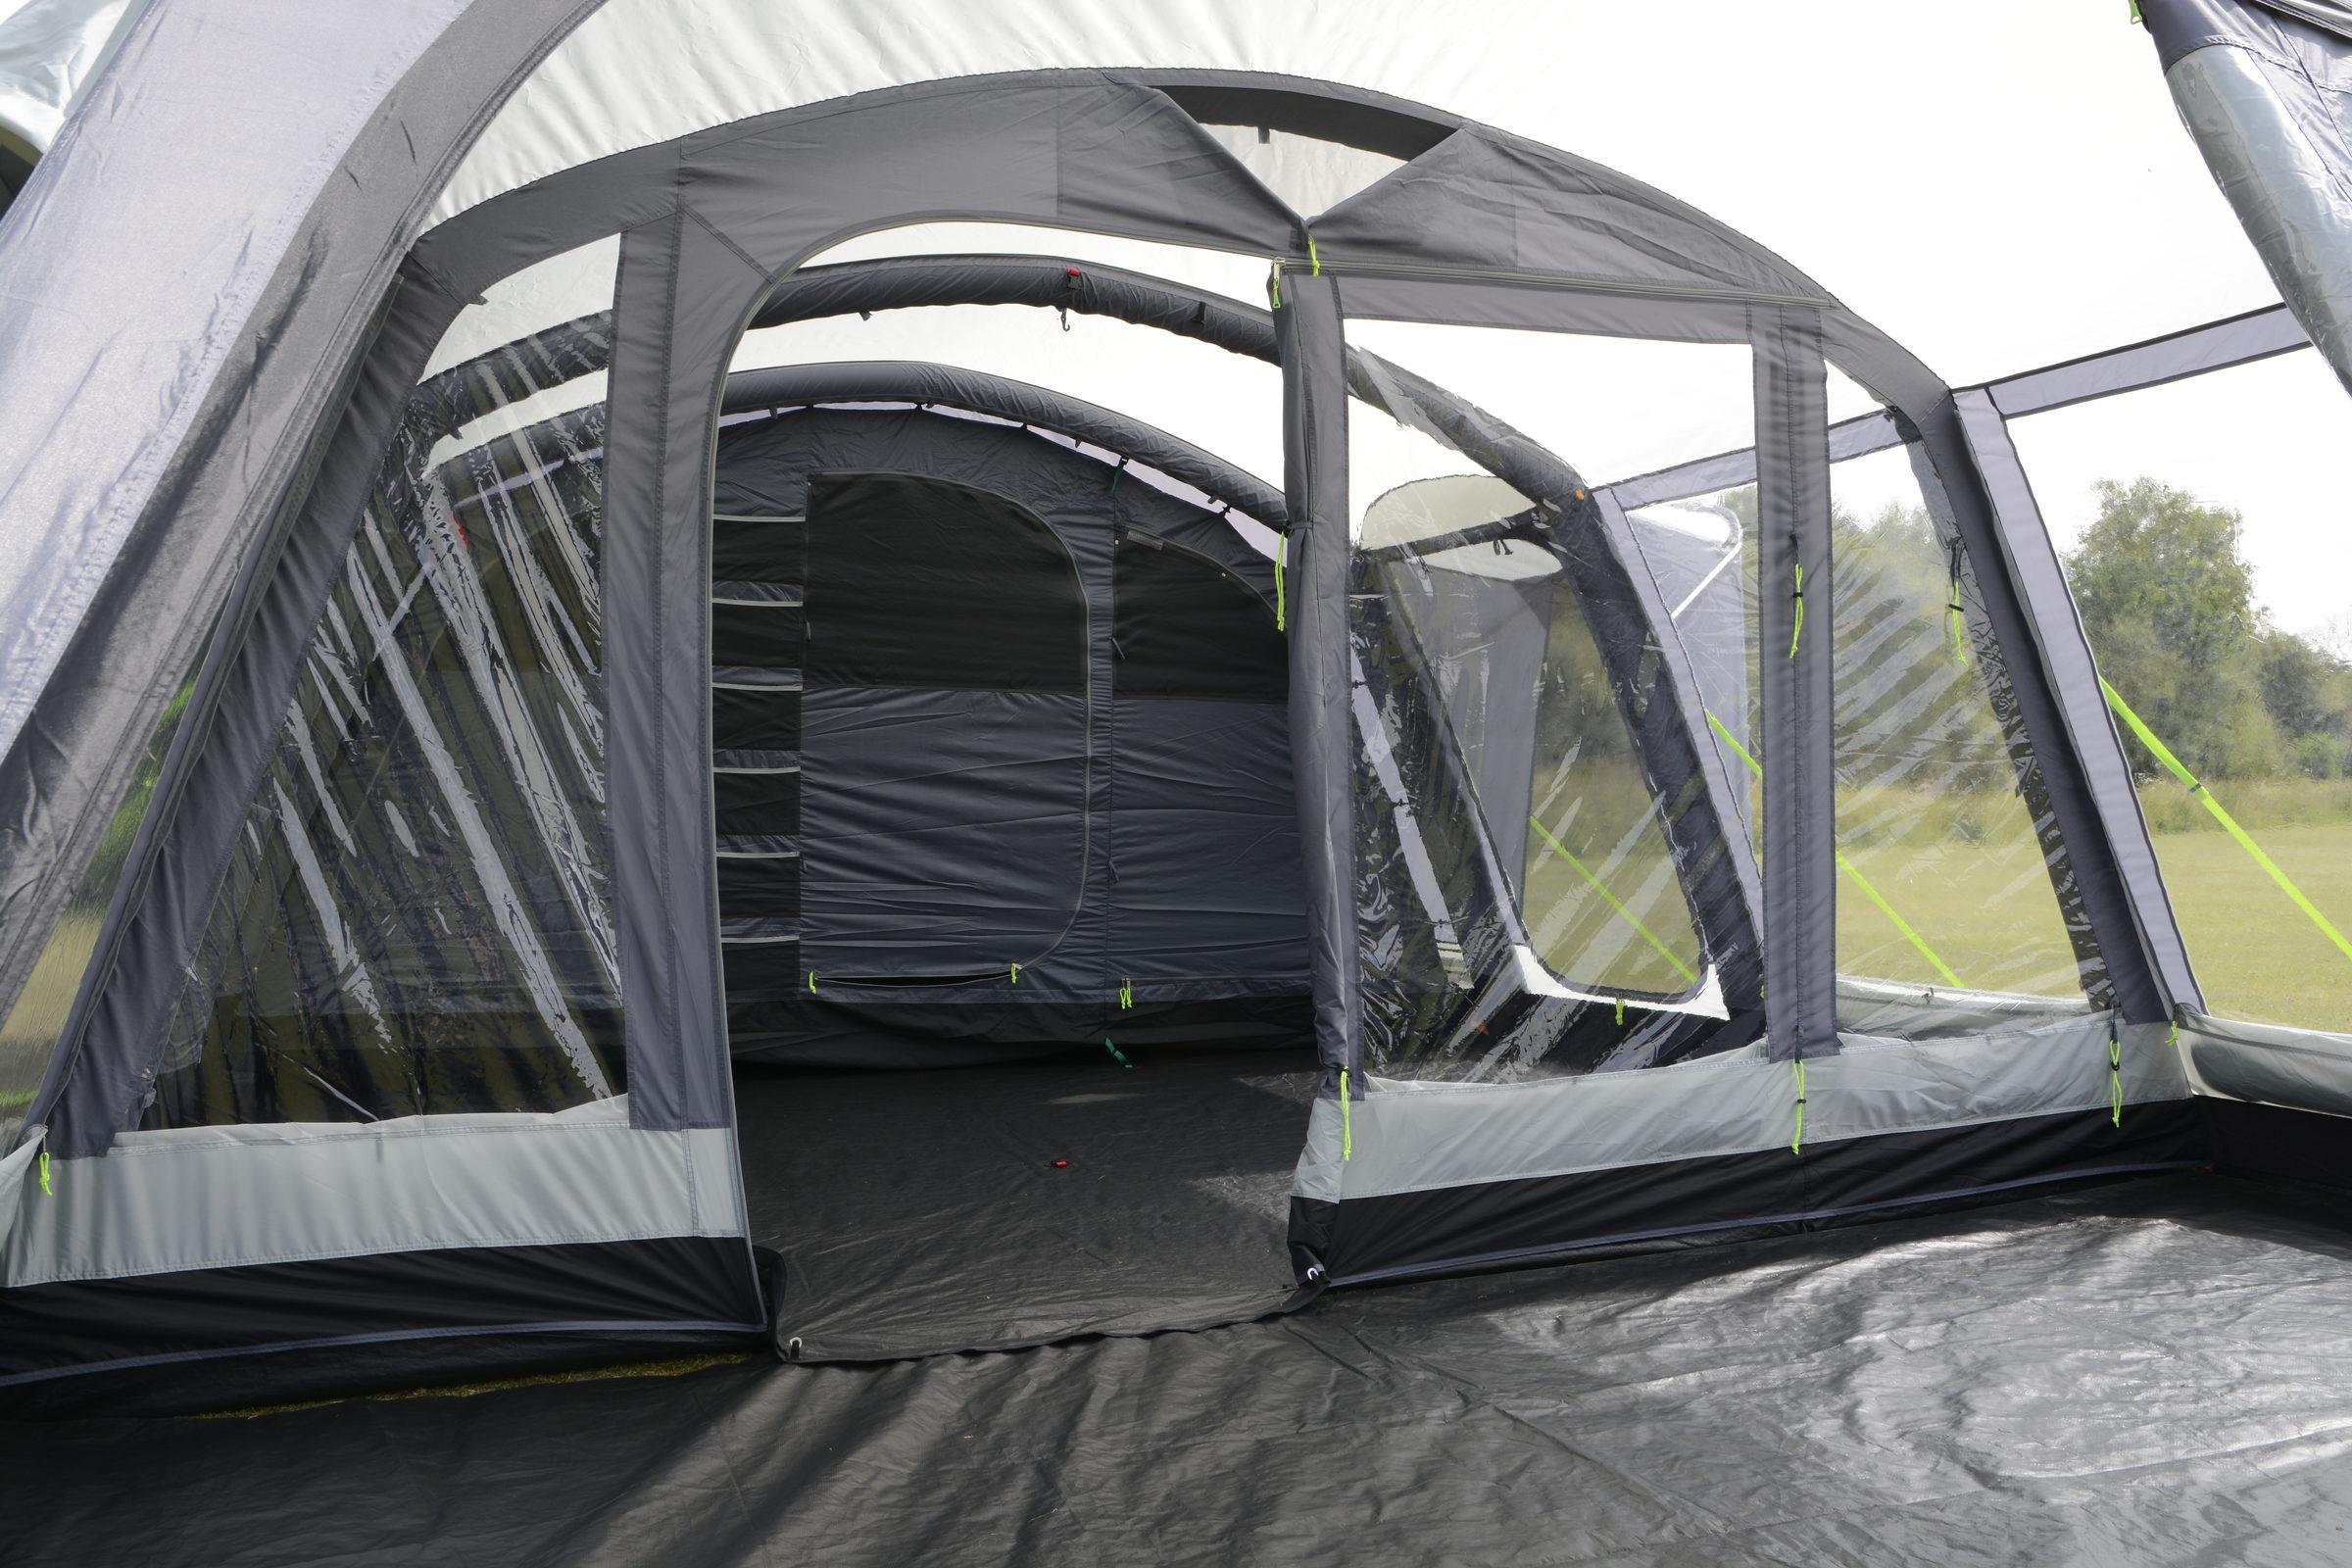 Kampa Croyde 6 Air Pro tent 2018 internal